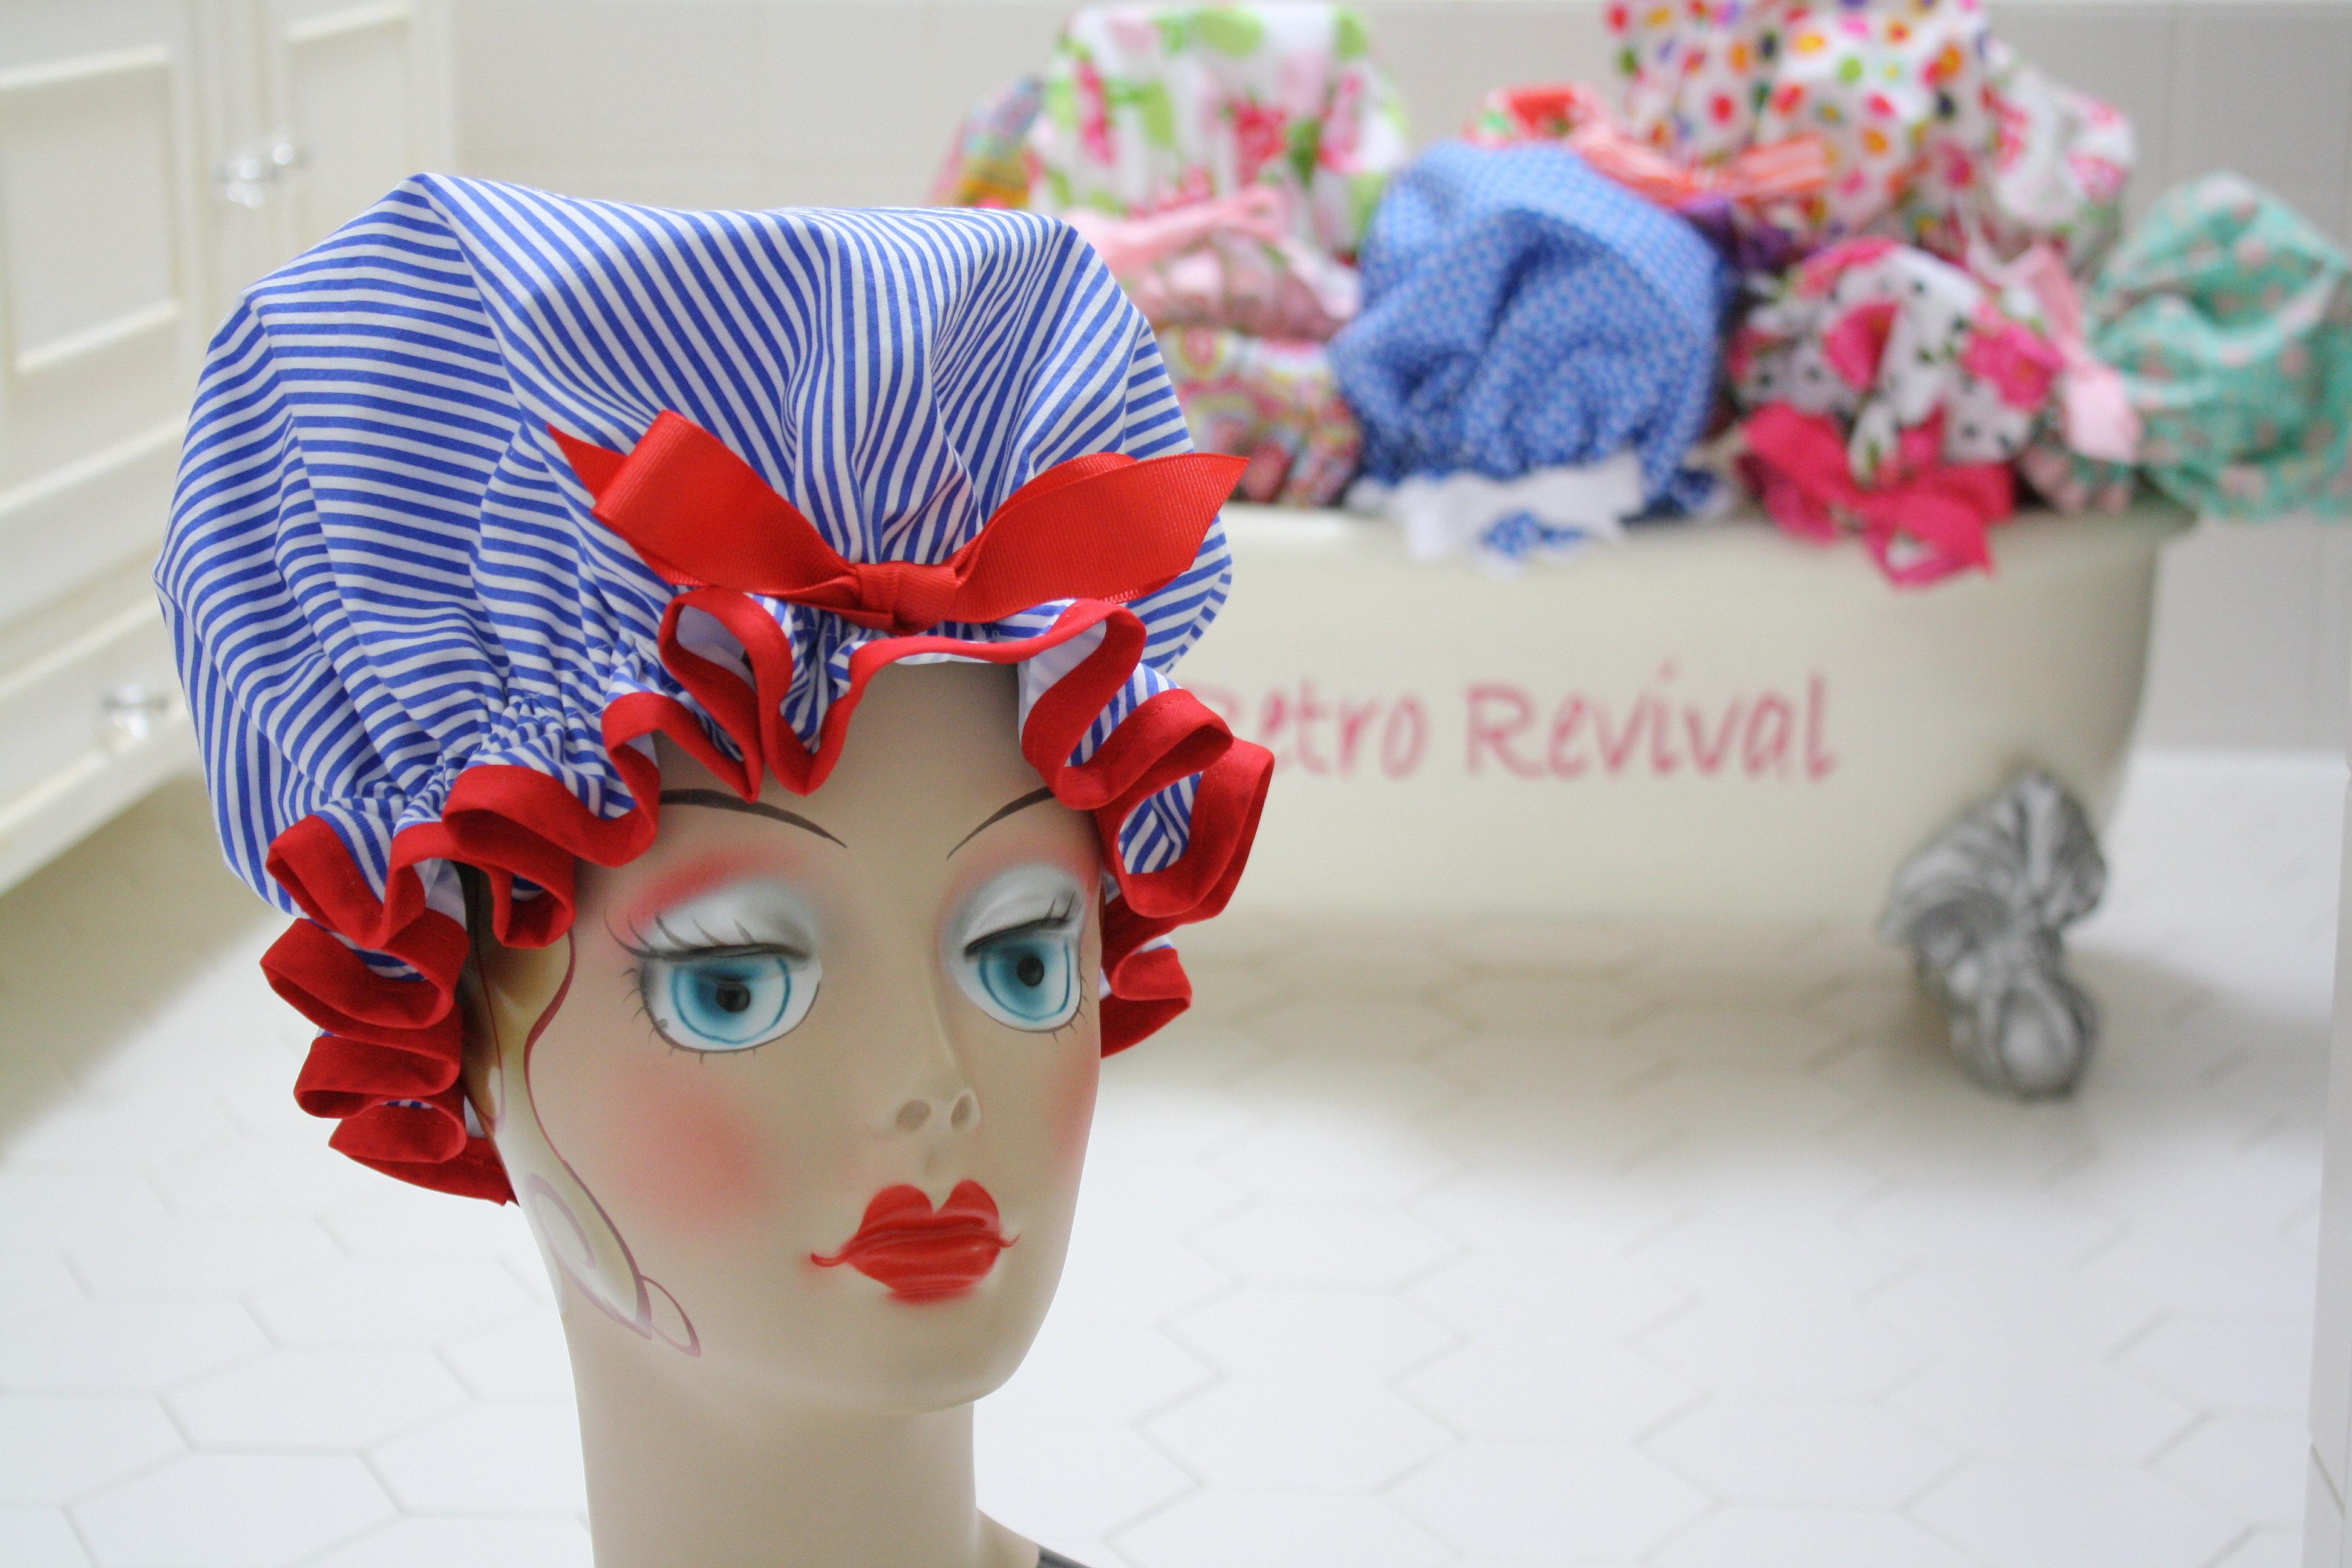 Red Retro Kitchen Accessories Retro Revival Handmade Aprons And Shower Caps Alexandria Va